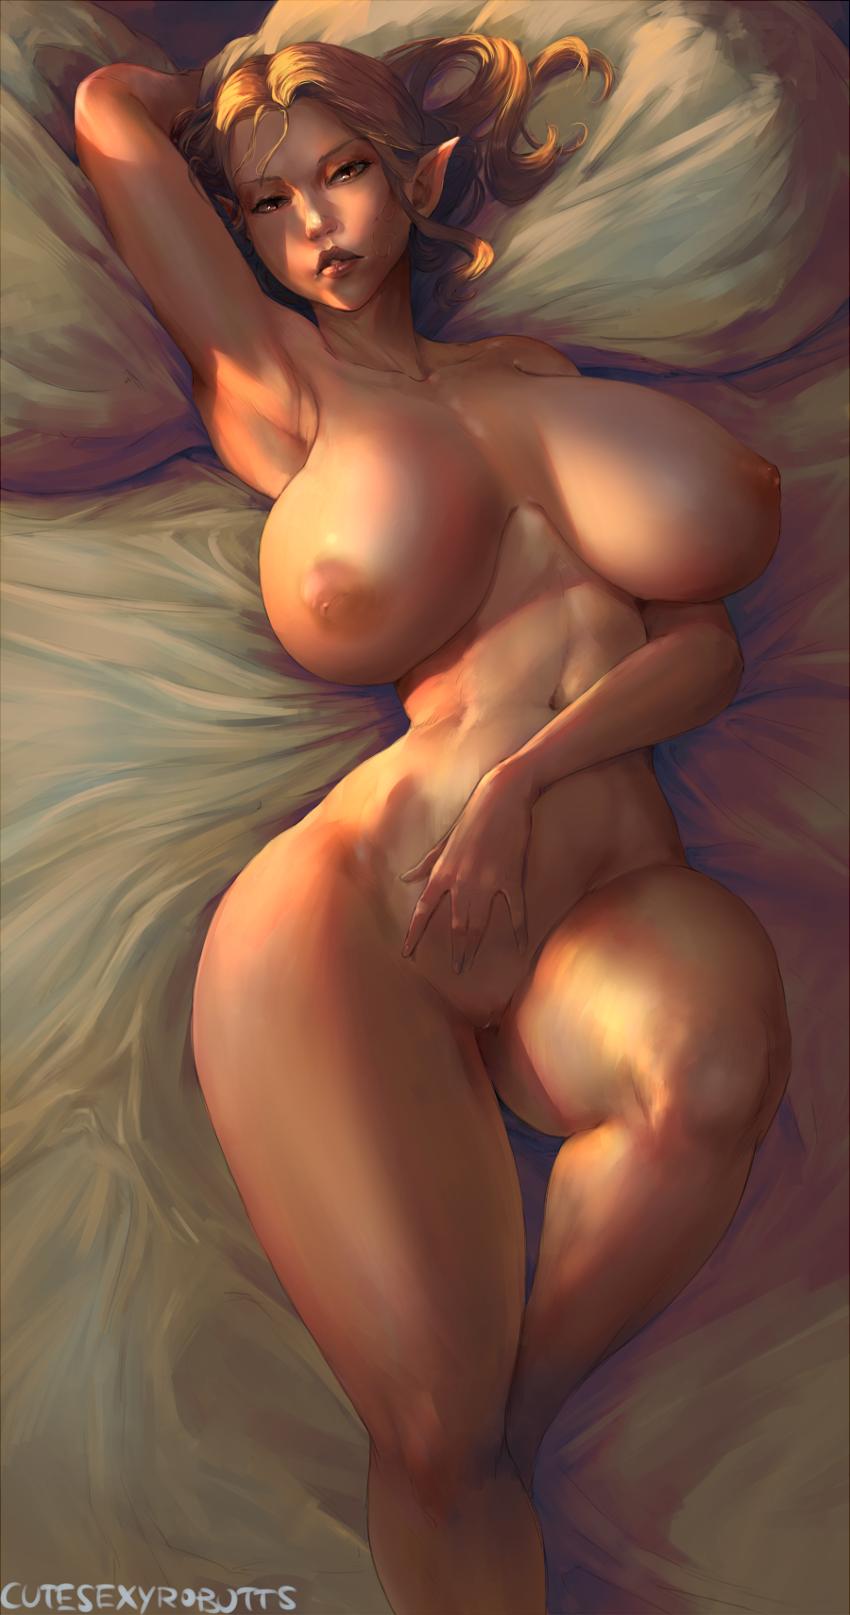 divinity chest original sin rope Dragon's dogma bigger breasts mod